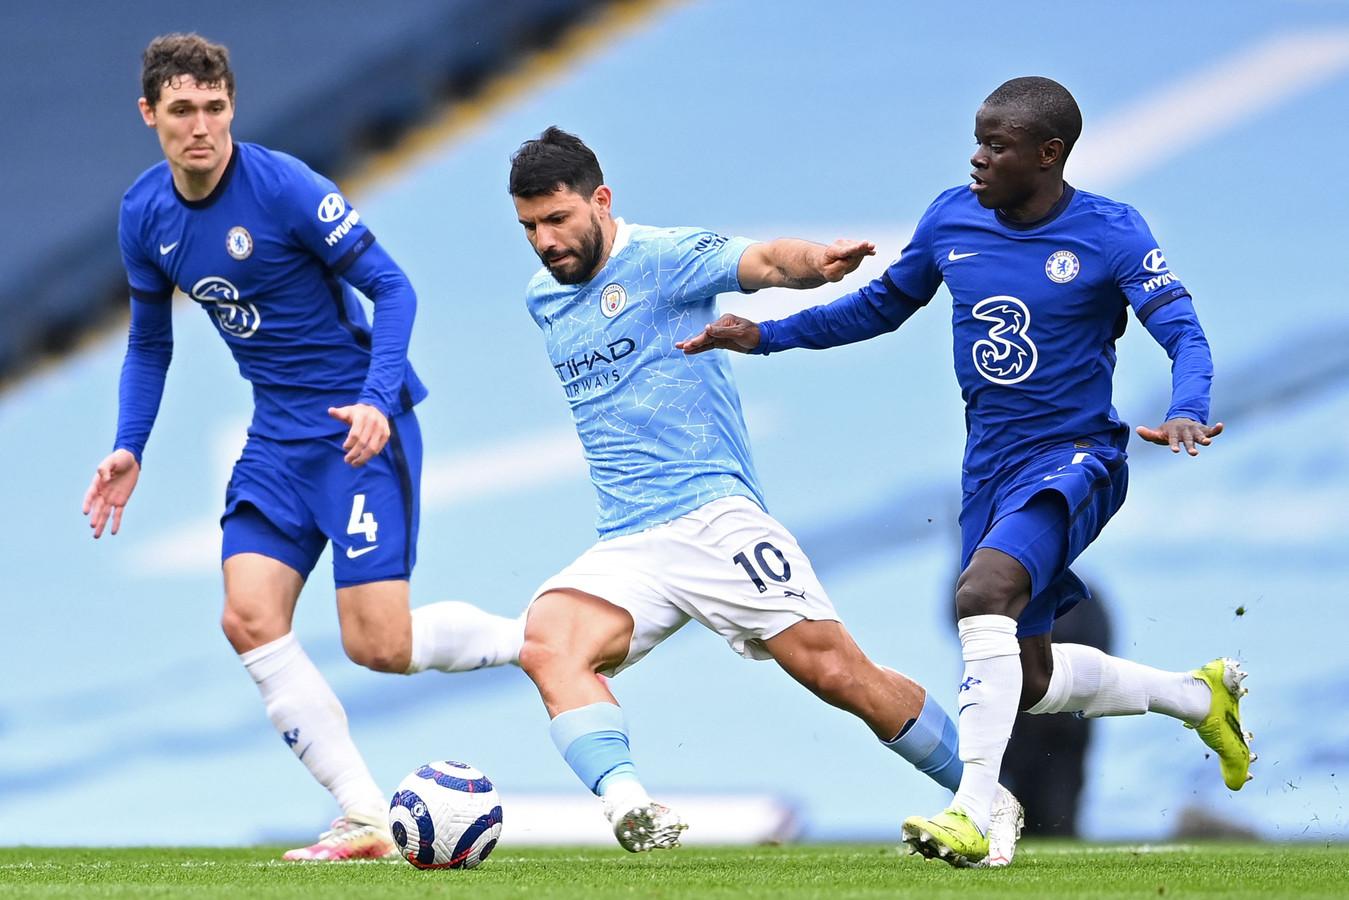 Manchester City-aanvaller Sergio Agüero in duel met Andreas Christensen (links) N'Golo Kanté van Chelsea.